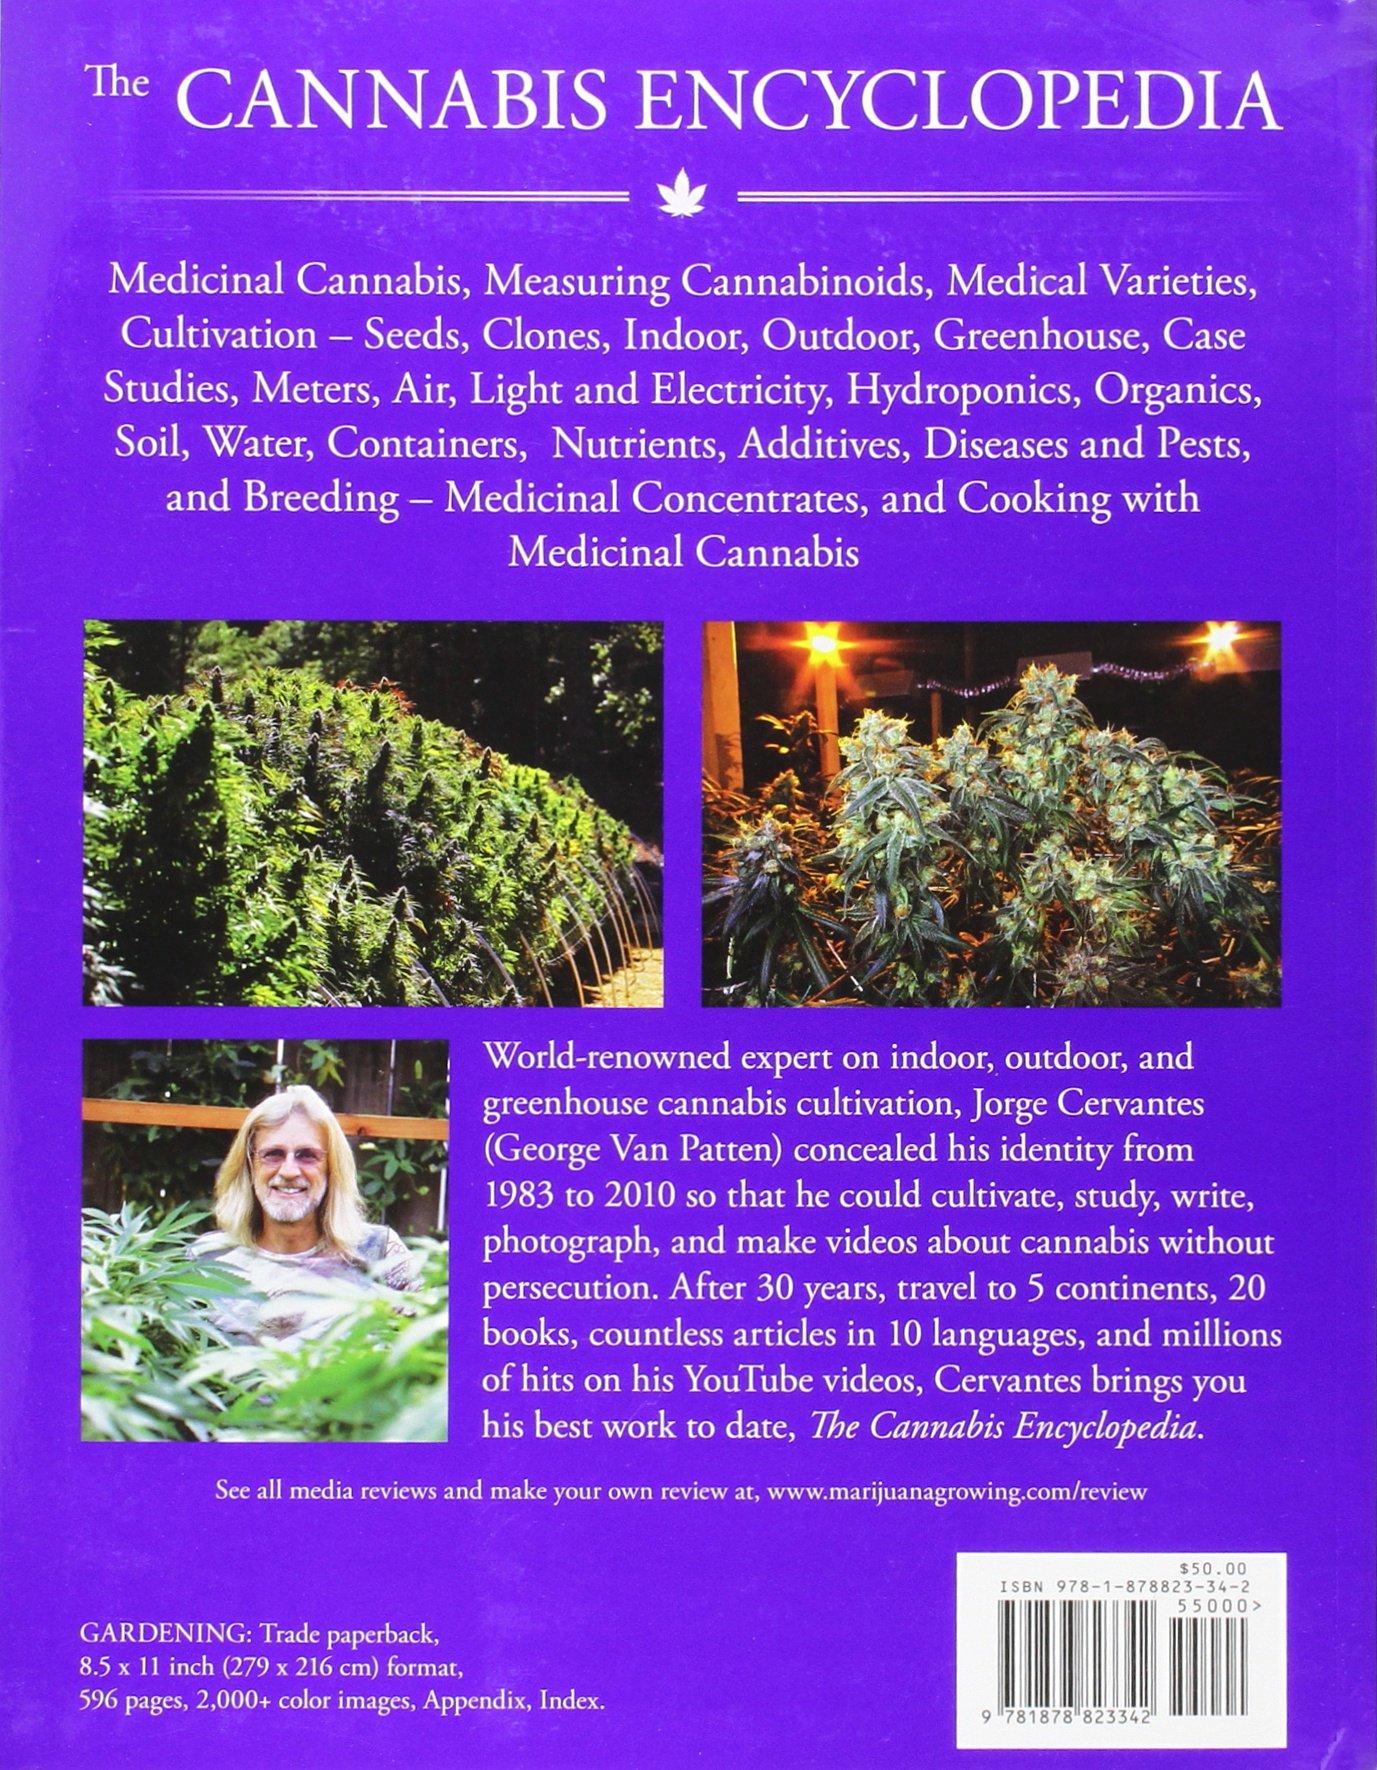 Amazon.com: The Cannabis Encyclopedia: The Definitive Guide to Cultivation  & Consumption of Medical Marijuana (8601423629124): Jorge Cervantes, ...